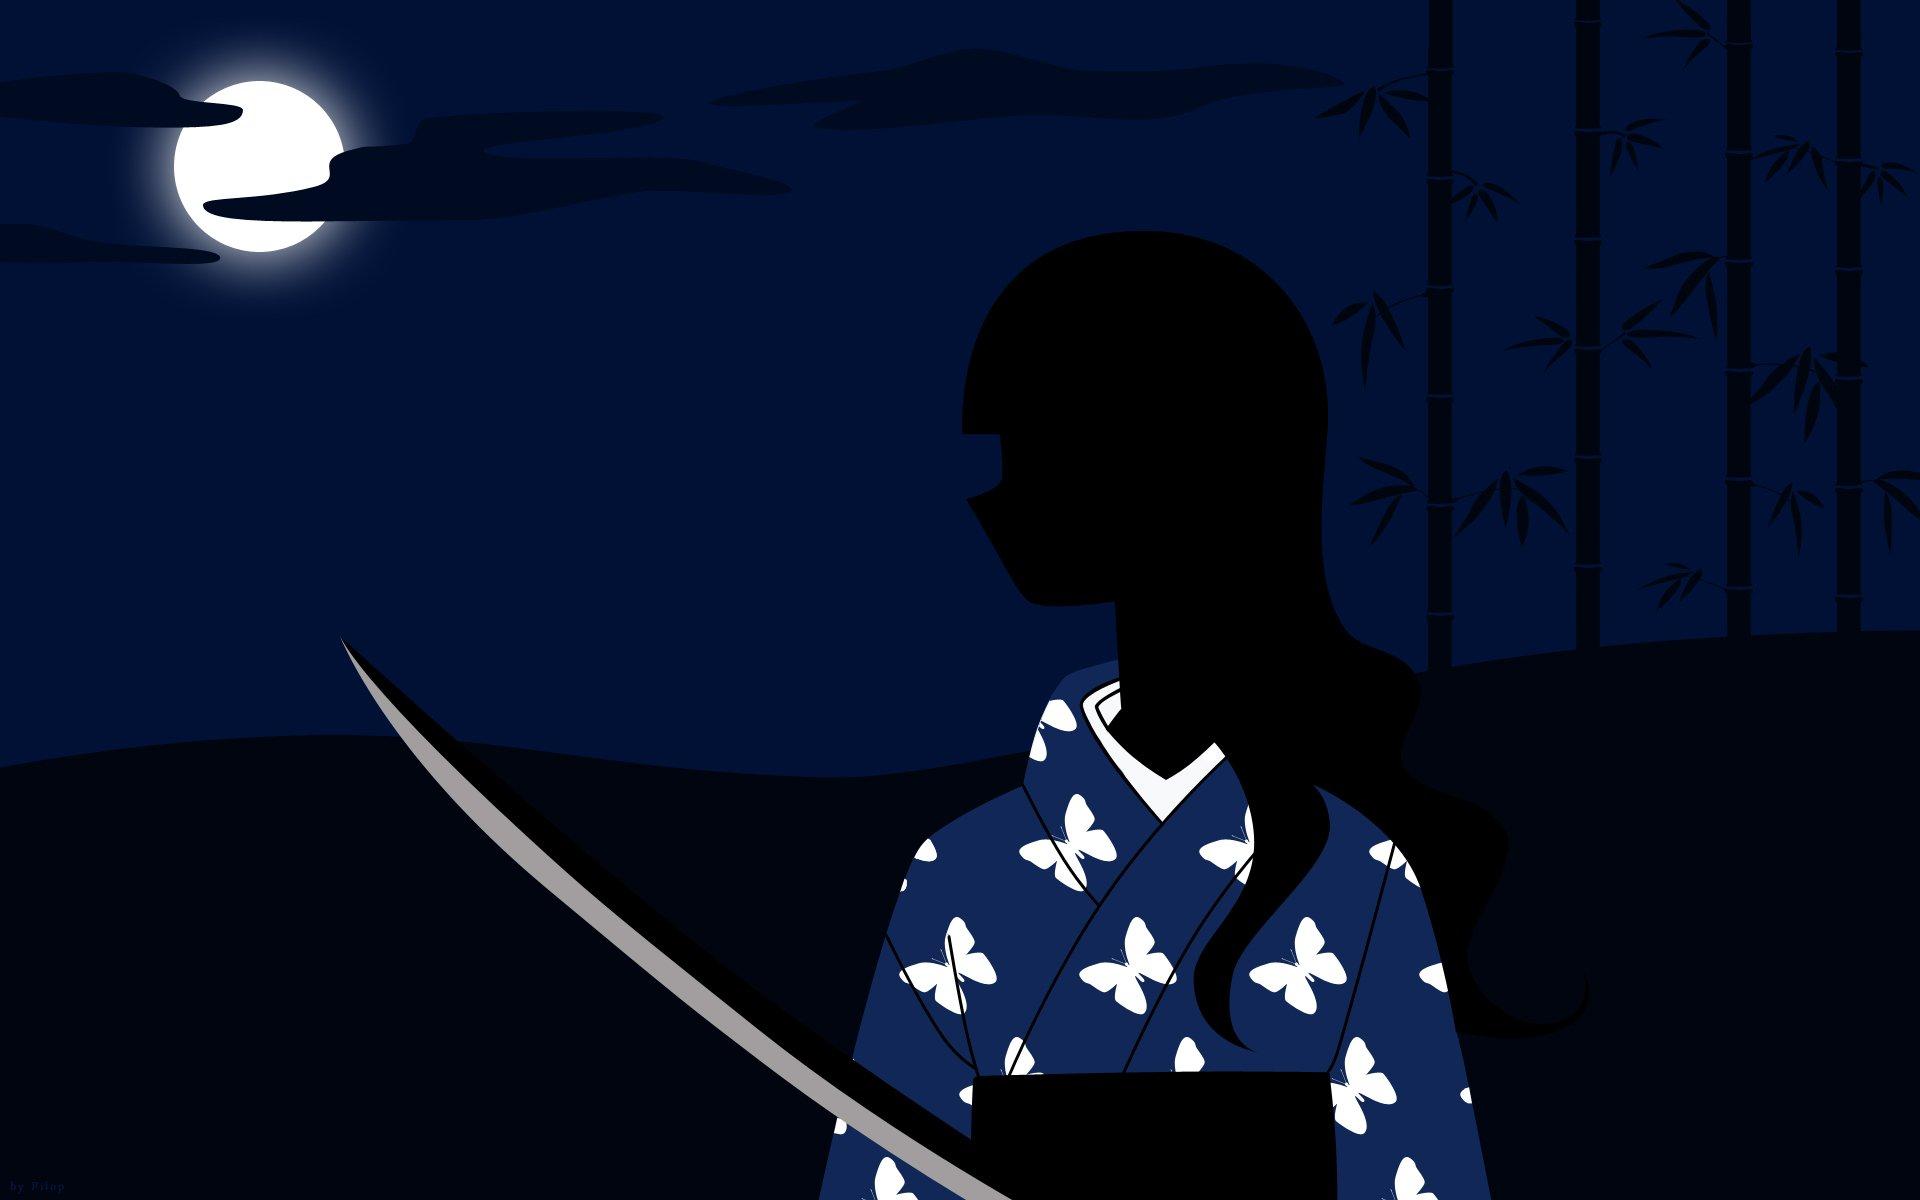 Sayonara Zetsubou Sensei Blue Clouds Dark Dress Night